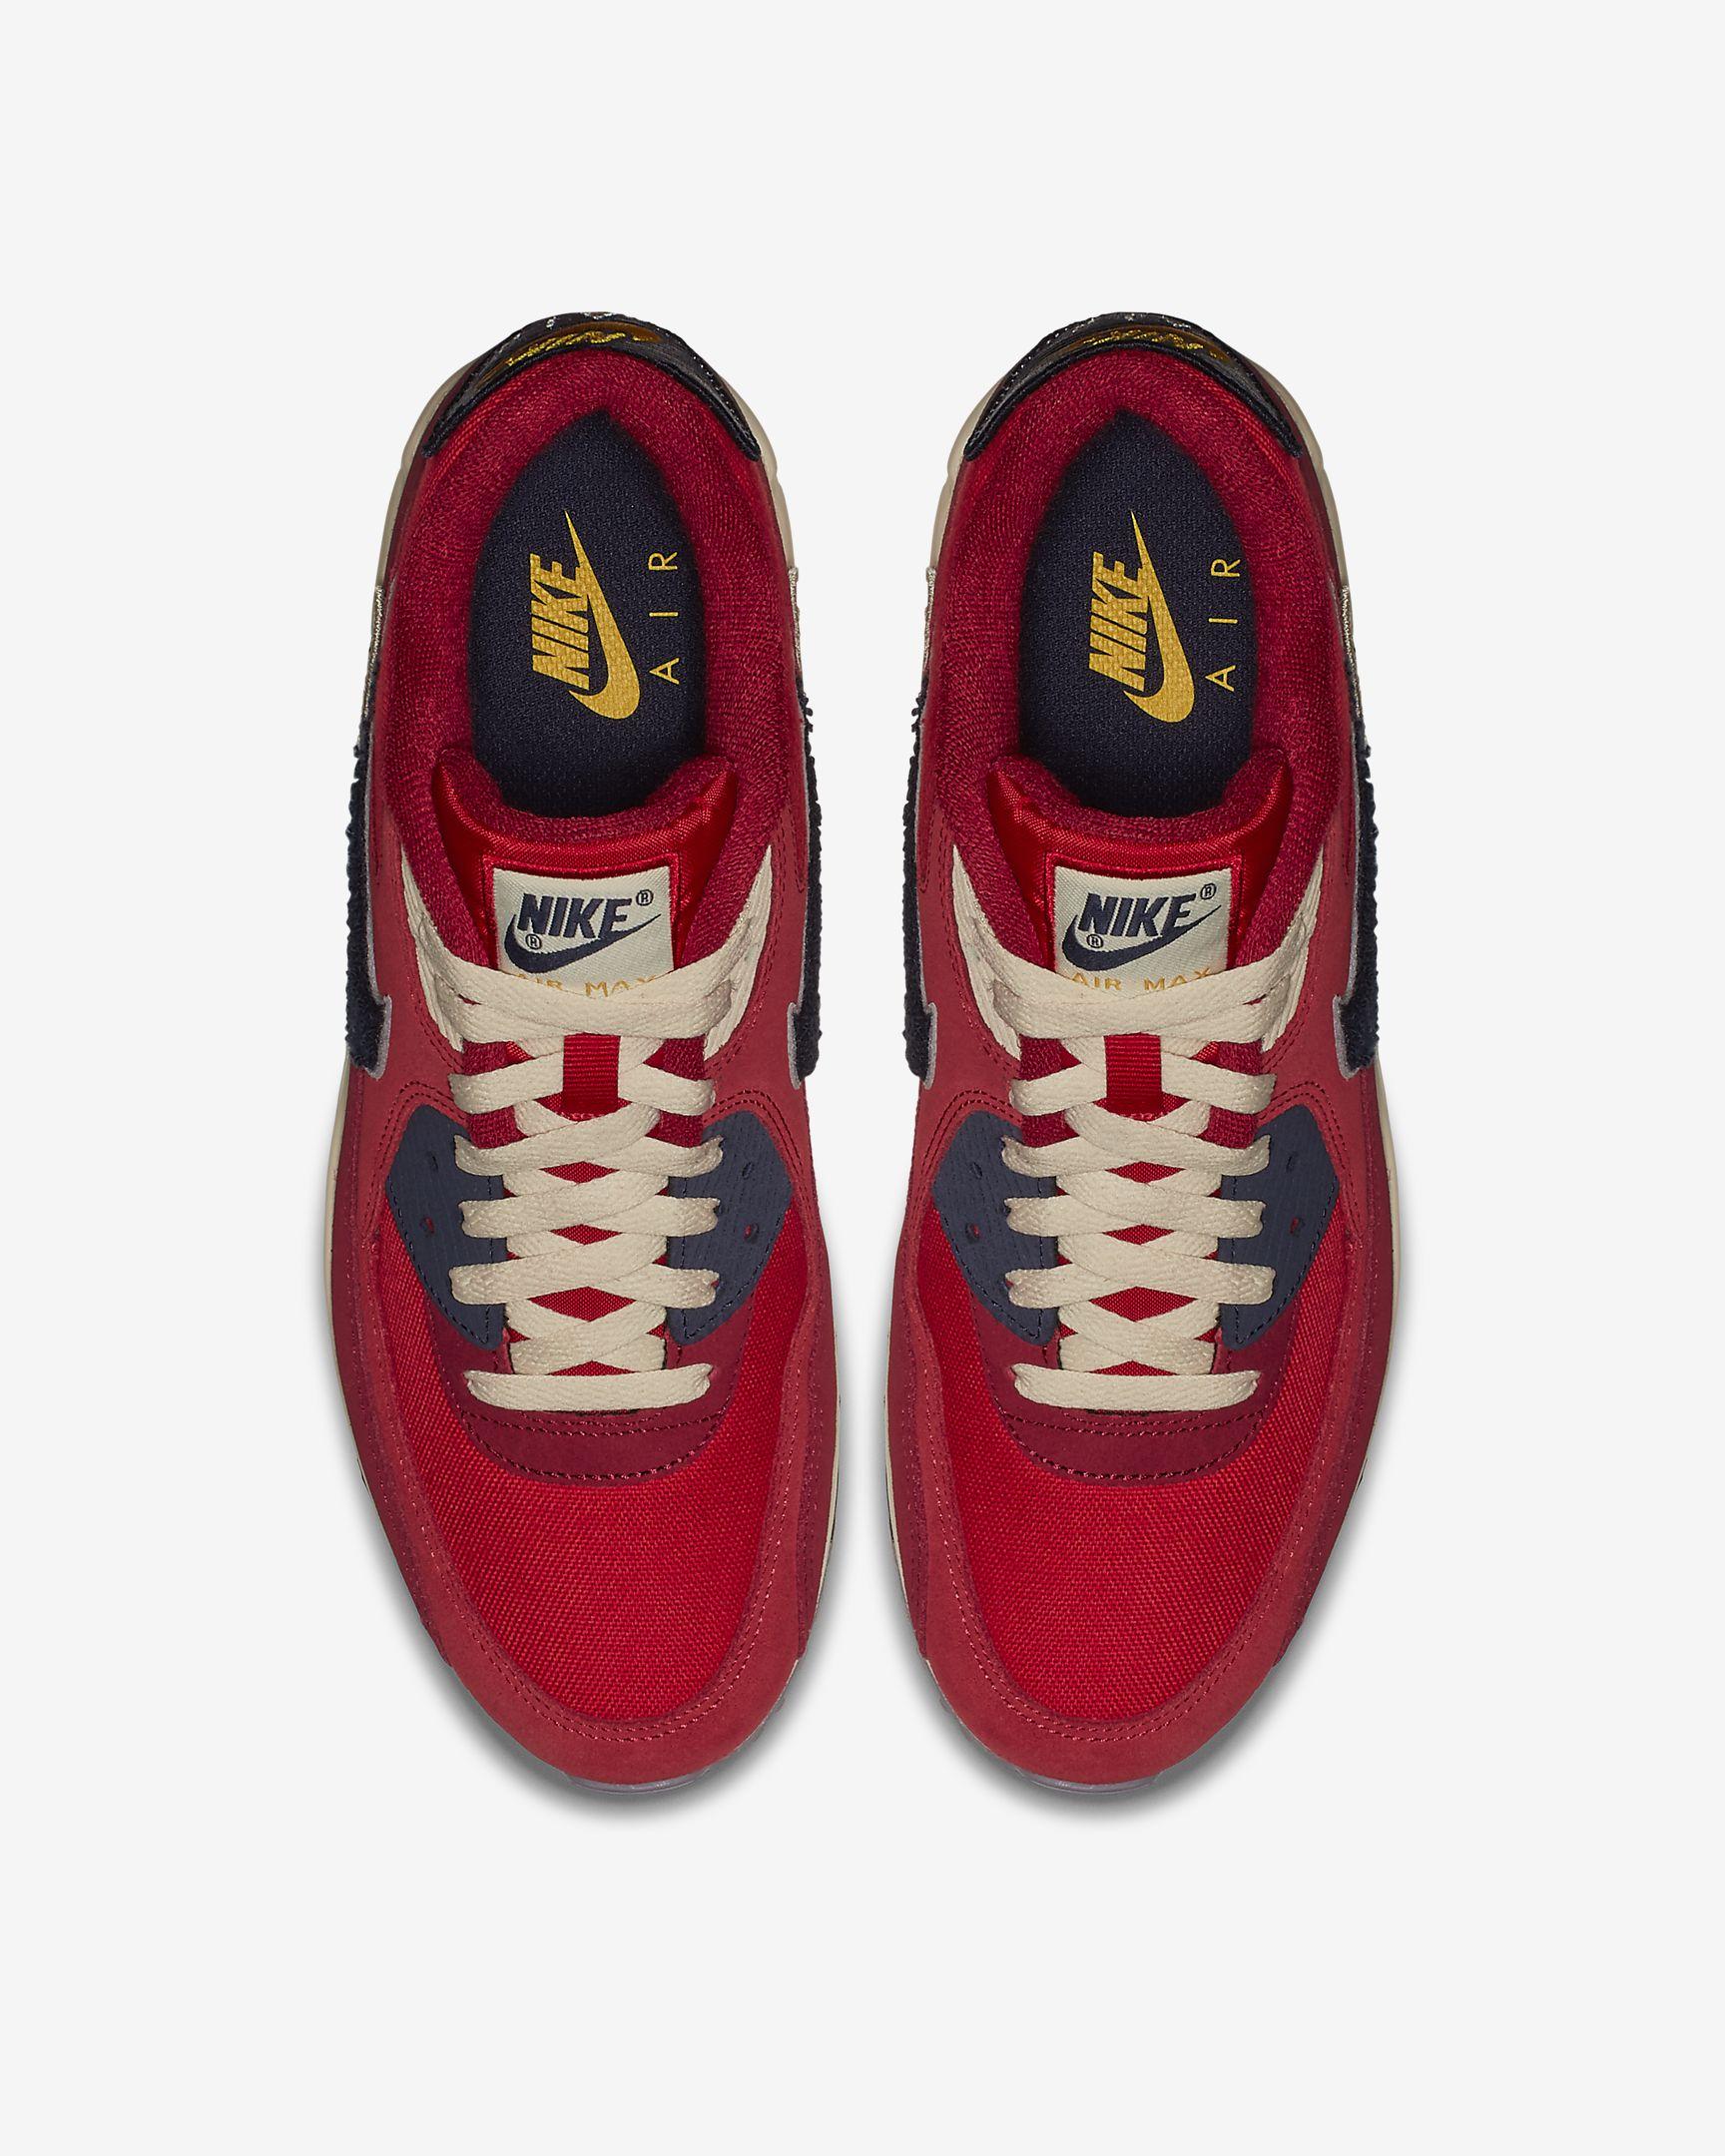 Nike Air Max 90 Premium SE 'Chenille Swoosh' (University Red